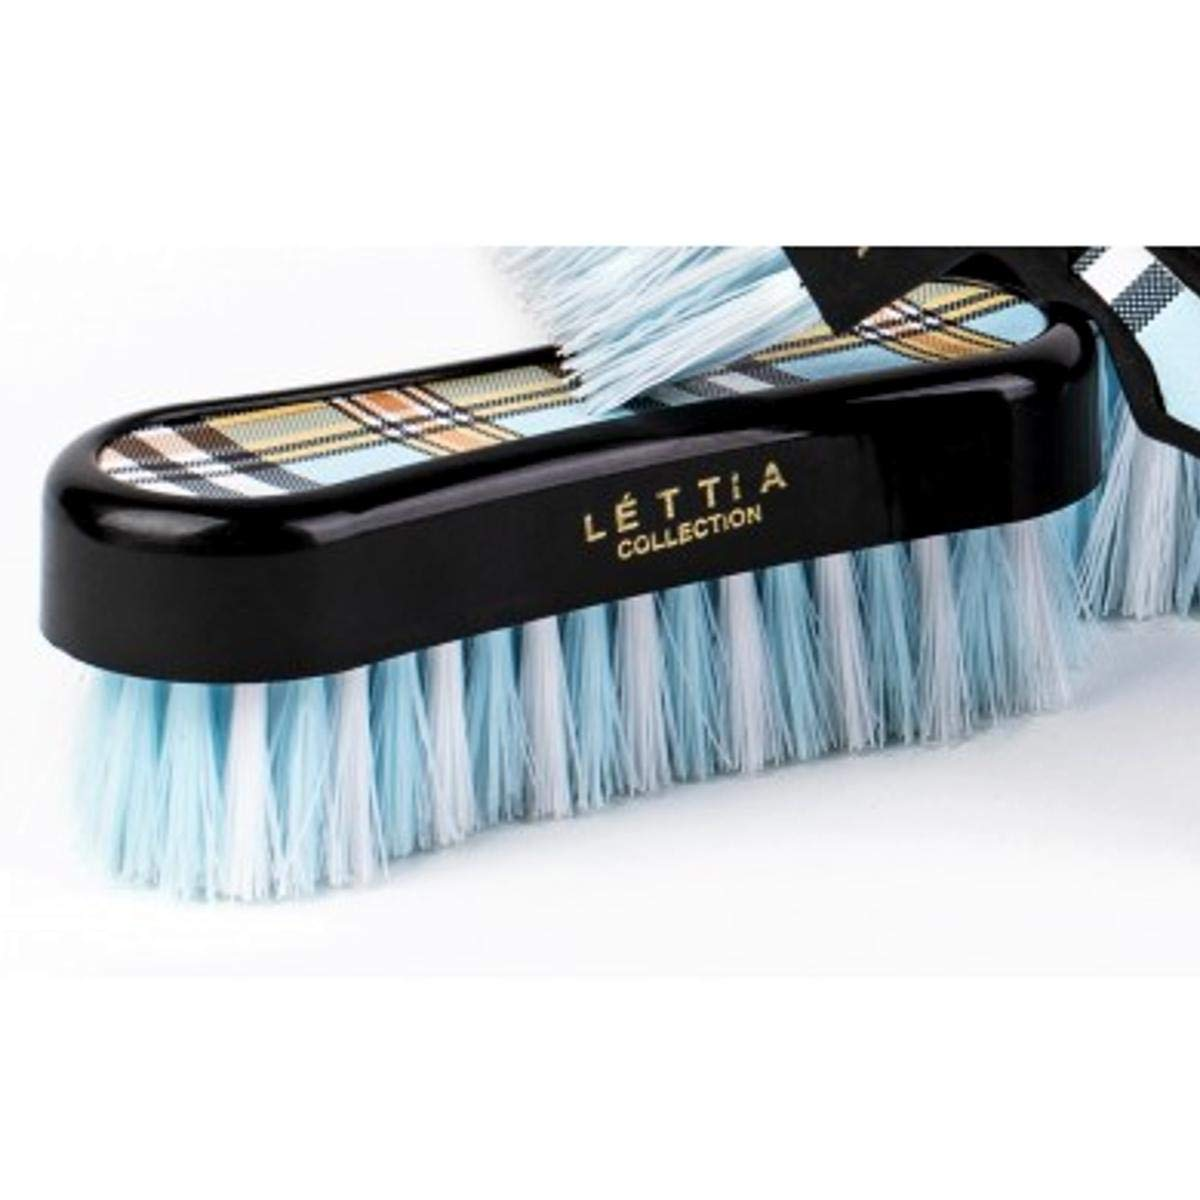 Lettia Tan Plaid Face Brush